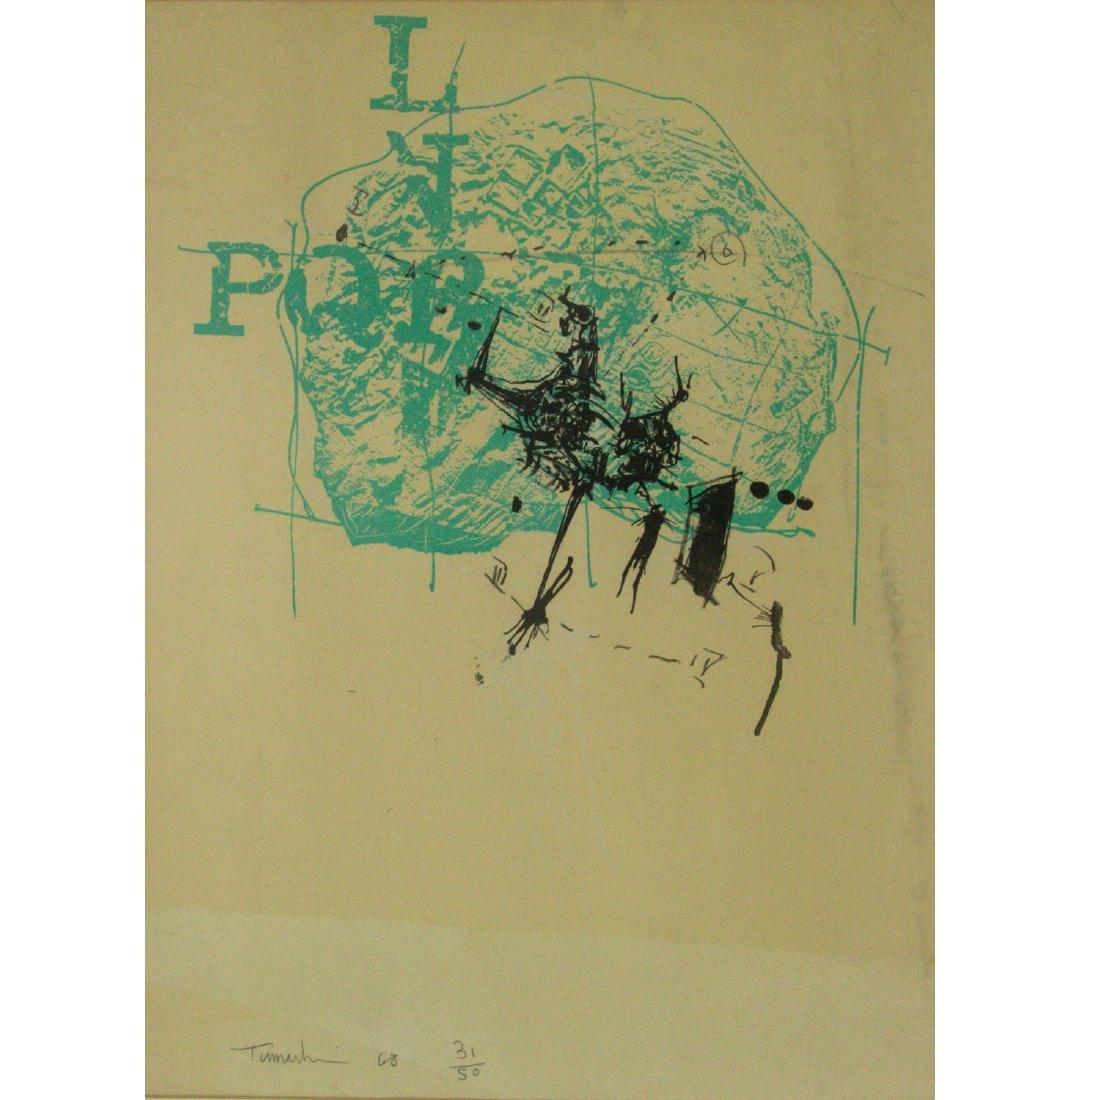 Igael Tumarkin (b.1933) - Lithograph, 1968.